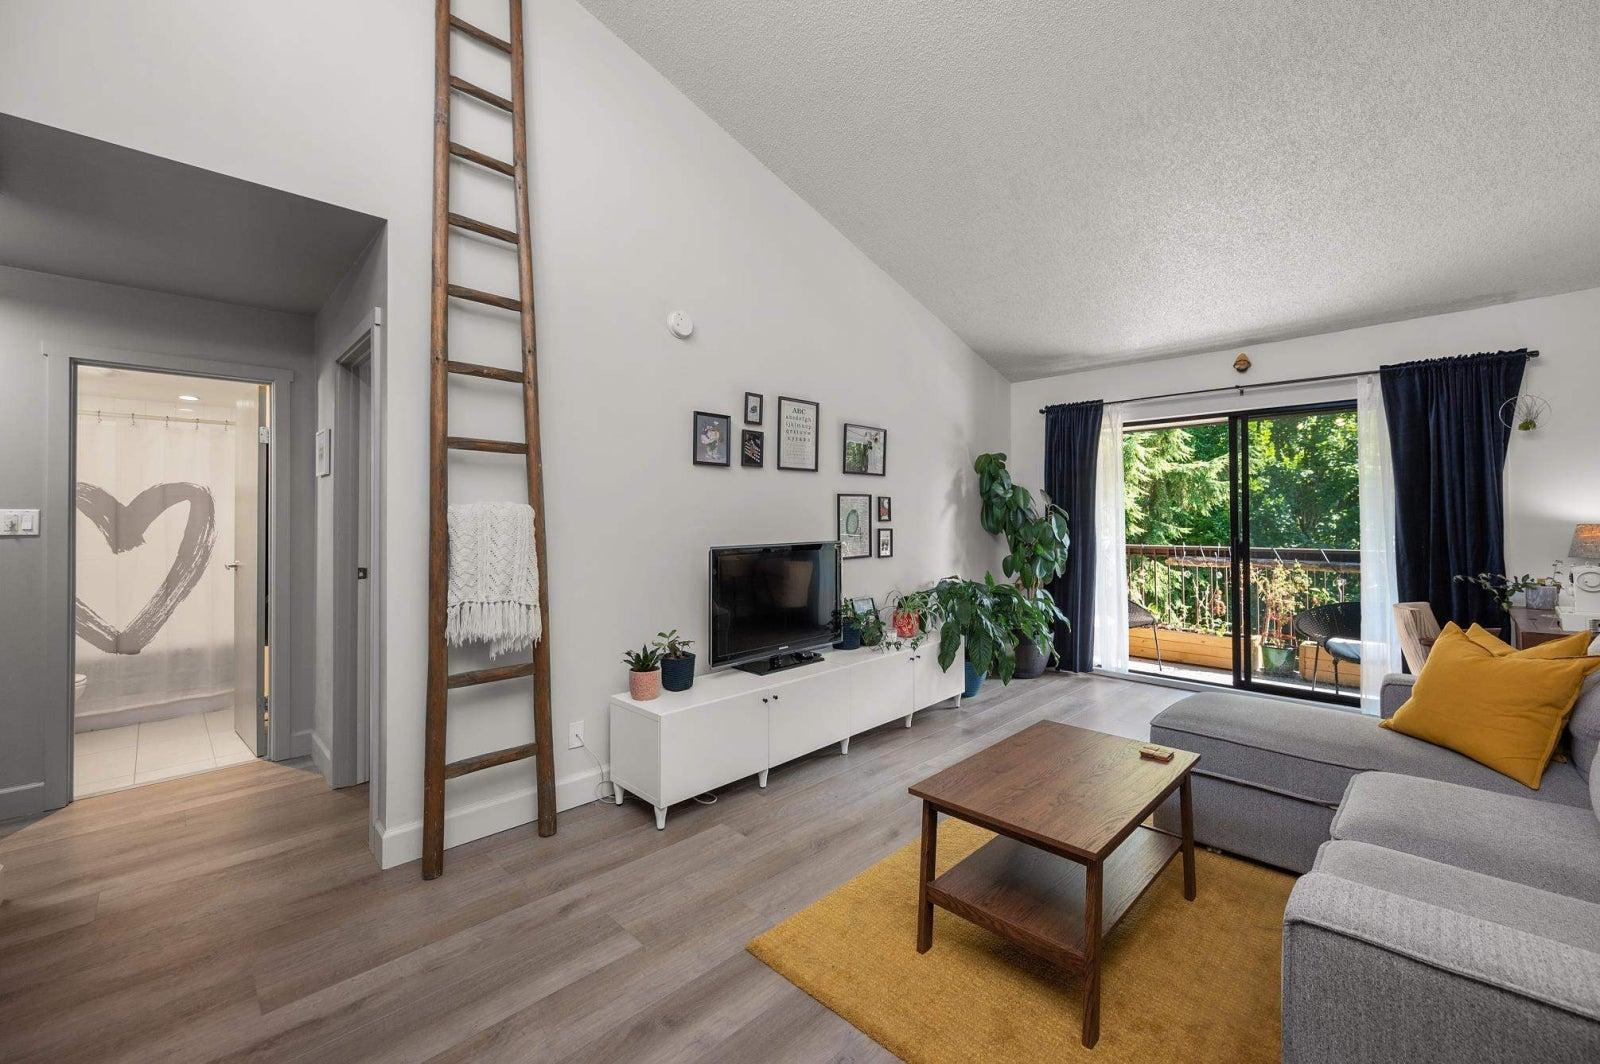 311 1515 E 5TH AVENUE - Grandview Woodland Apartment/Condo for sale, 1 Bedroom (R2615831)